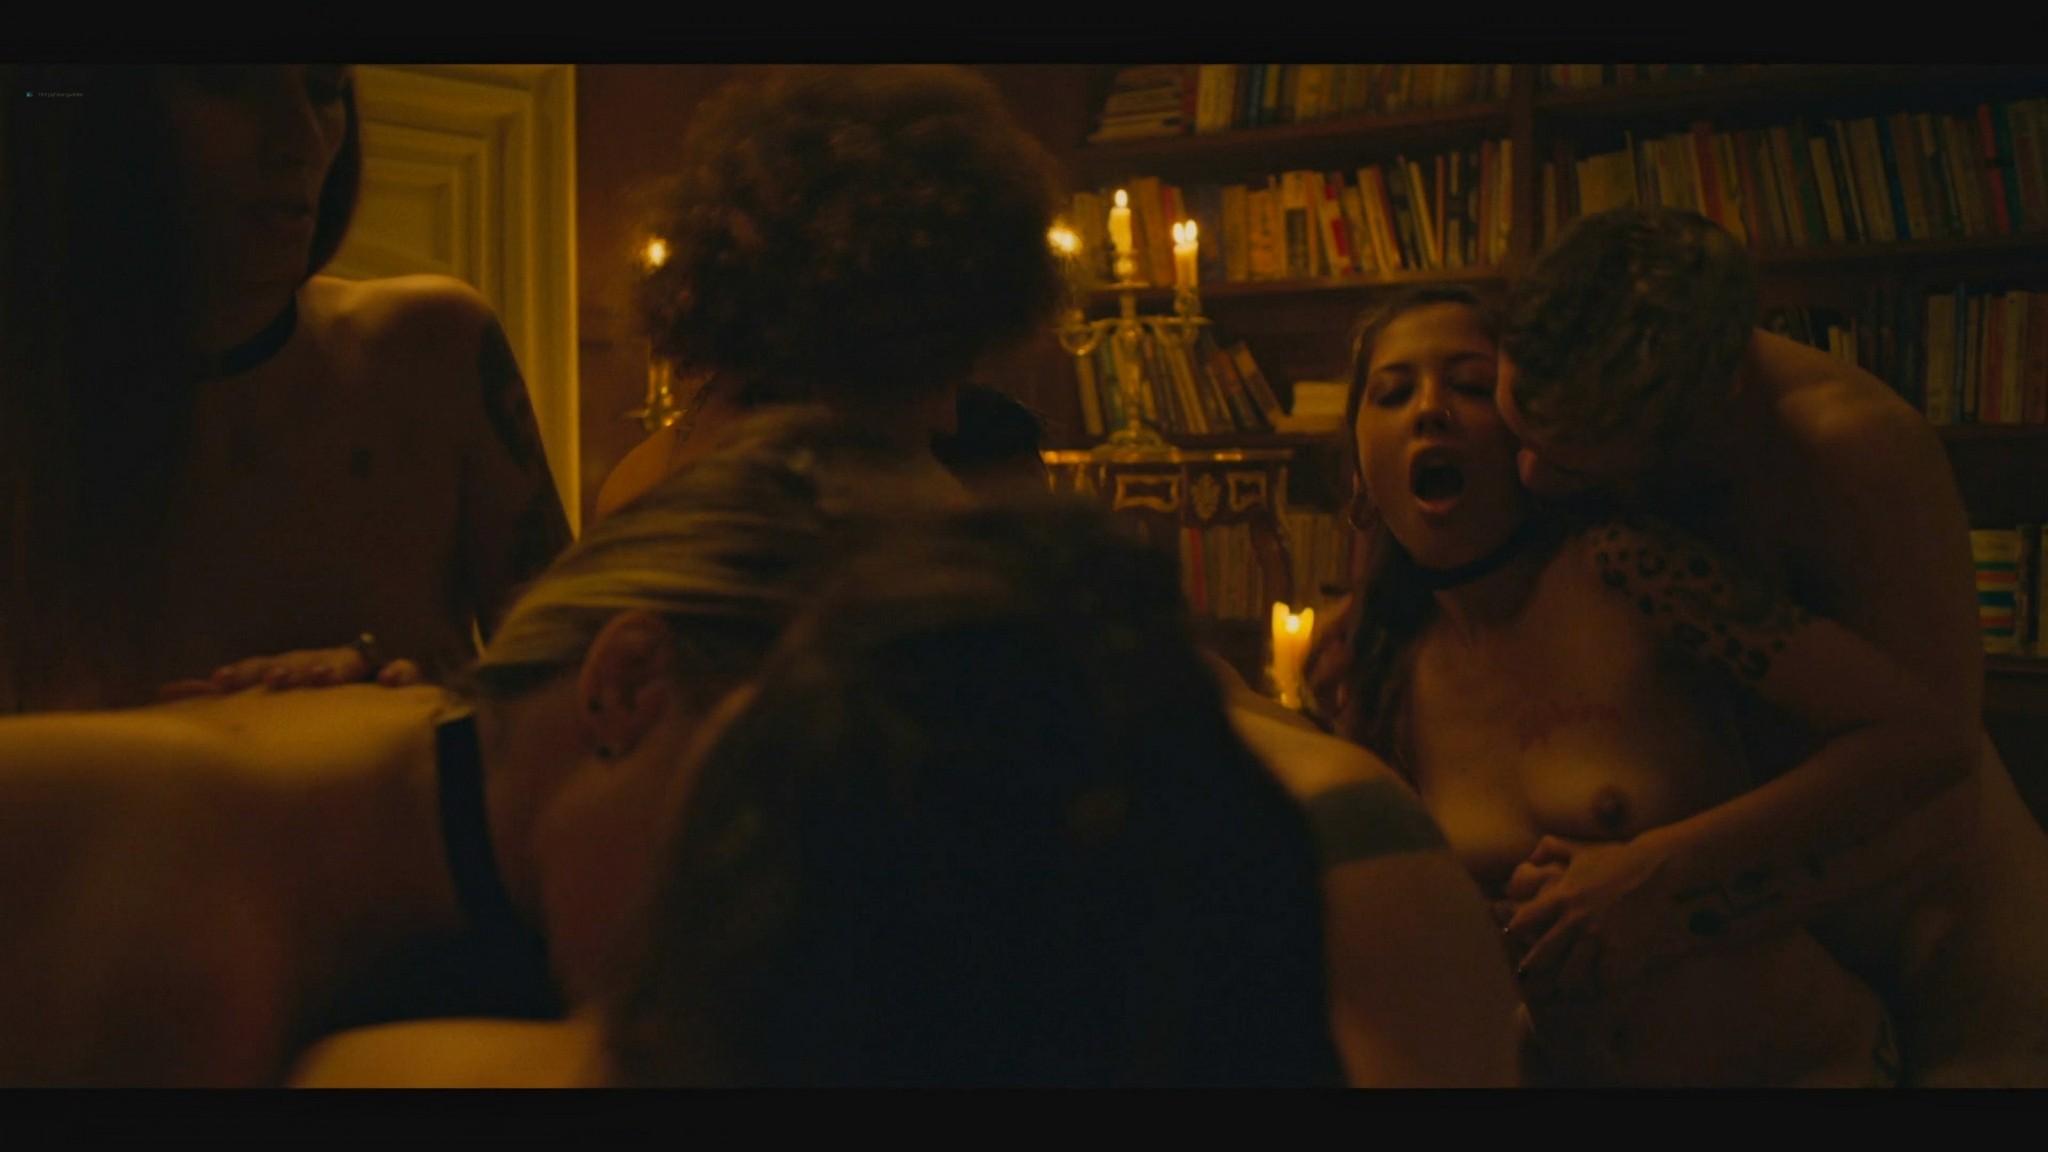 Brunna Martins nude Carolina Ferraz Natalia Lage and others nude orgy and sexy Hard 2021 s3e1 2 1080p Web 16